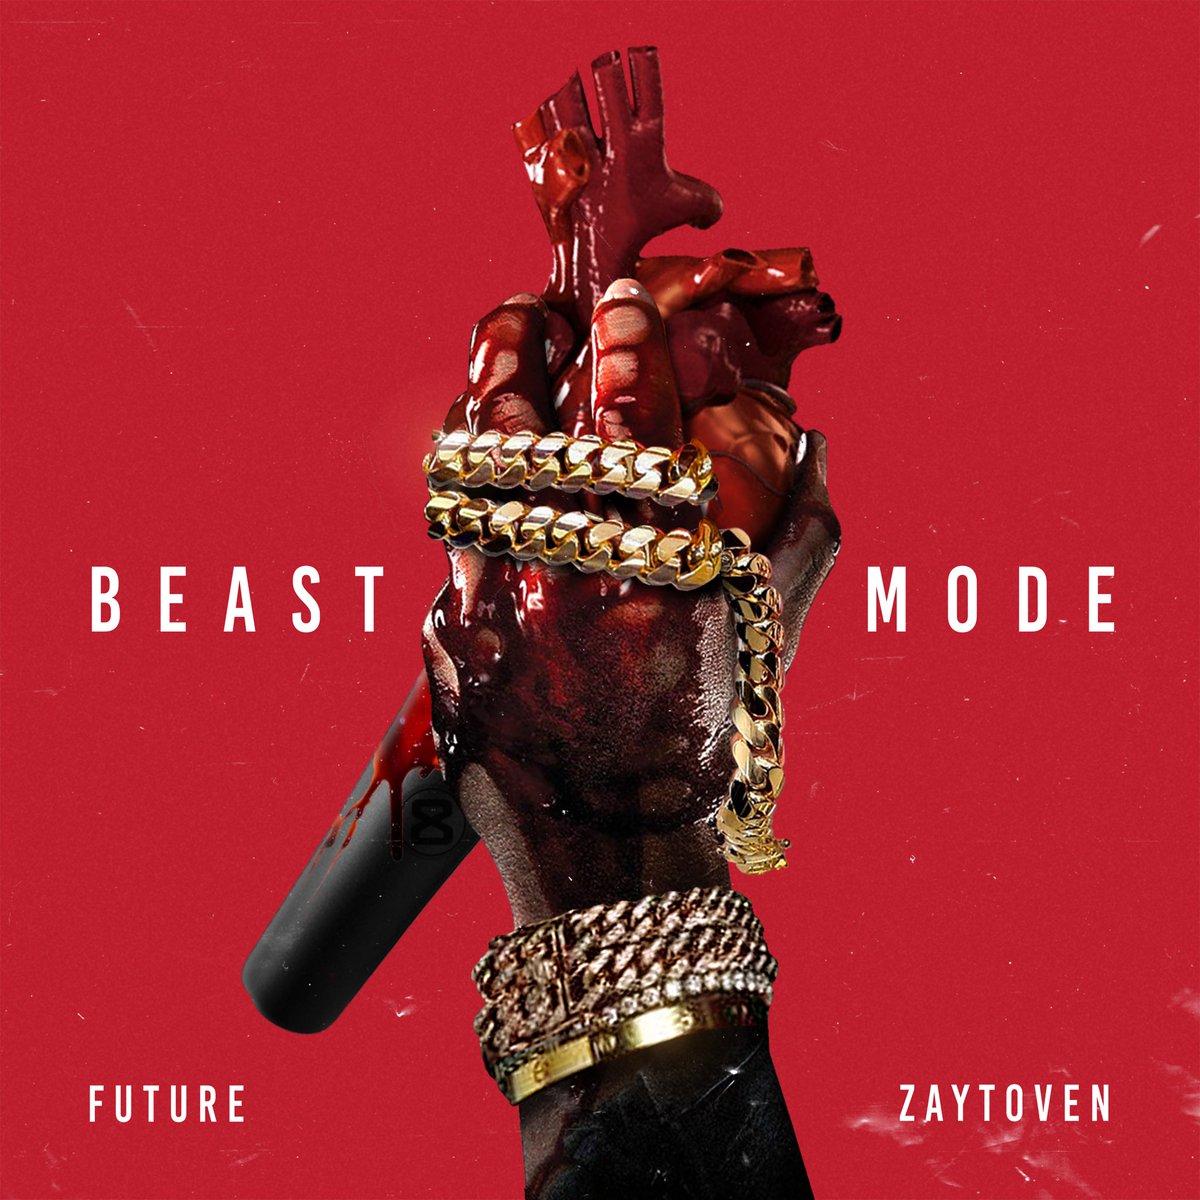 @1future's photo on Beast Mode